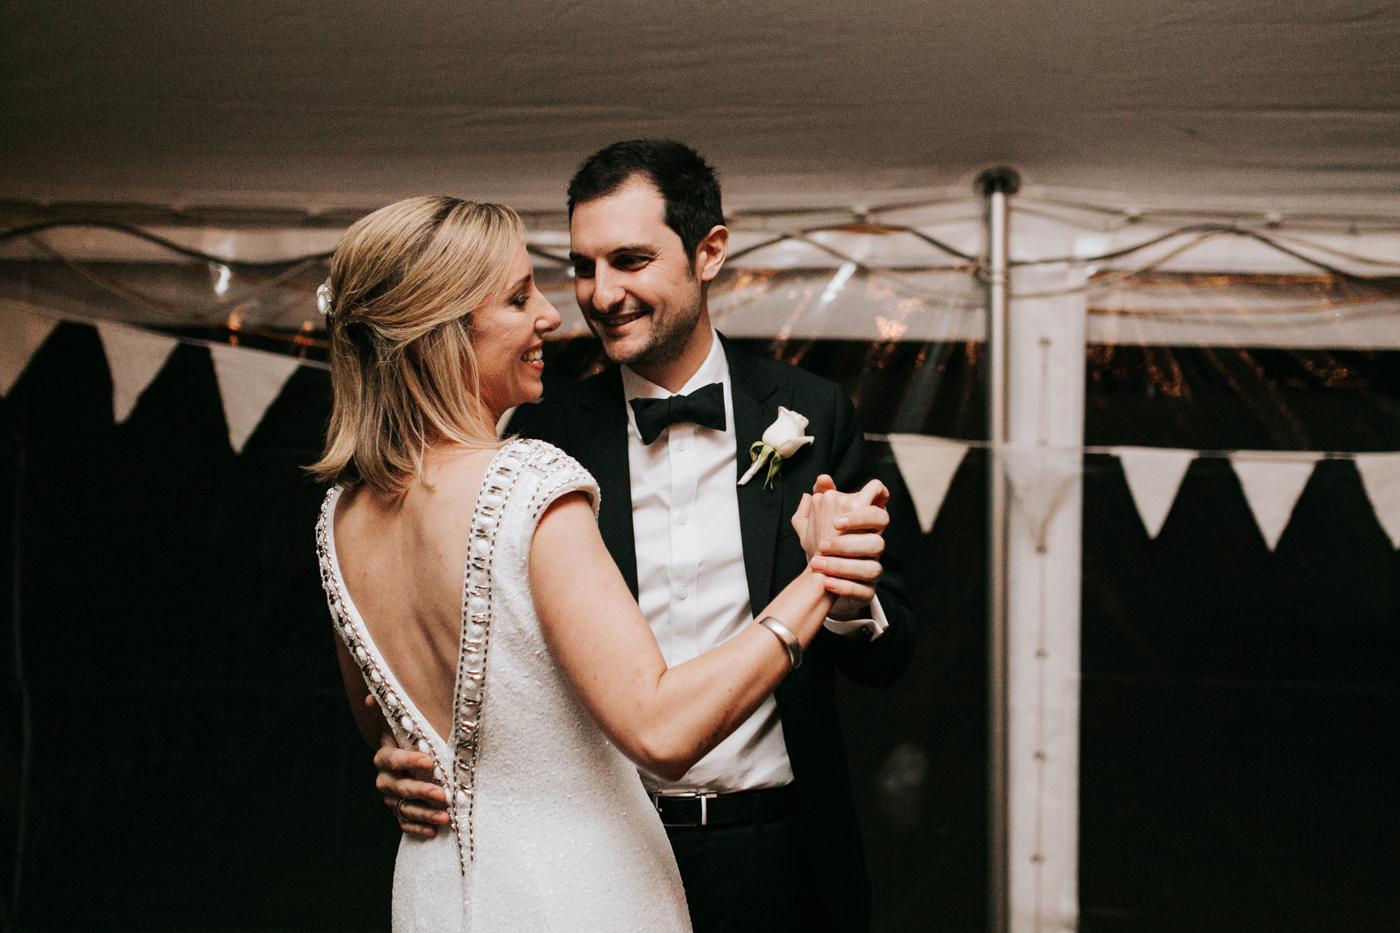 Bridget & James - Orange Country Wedding - Samantha Heather Photography-272.jpg